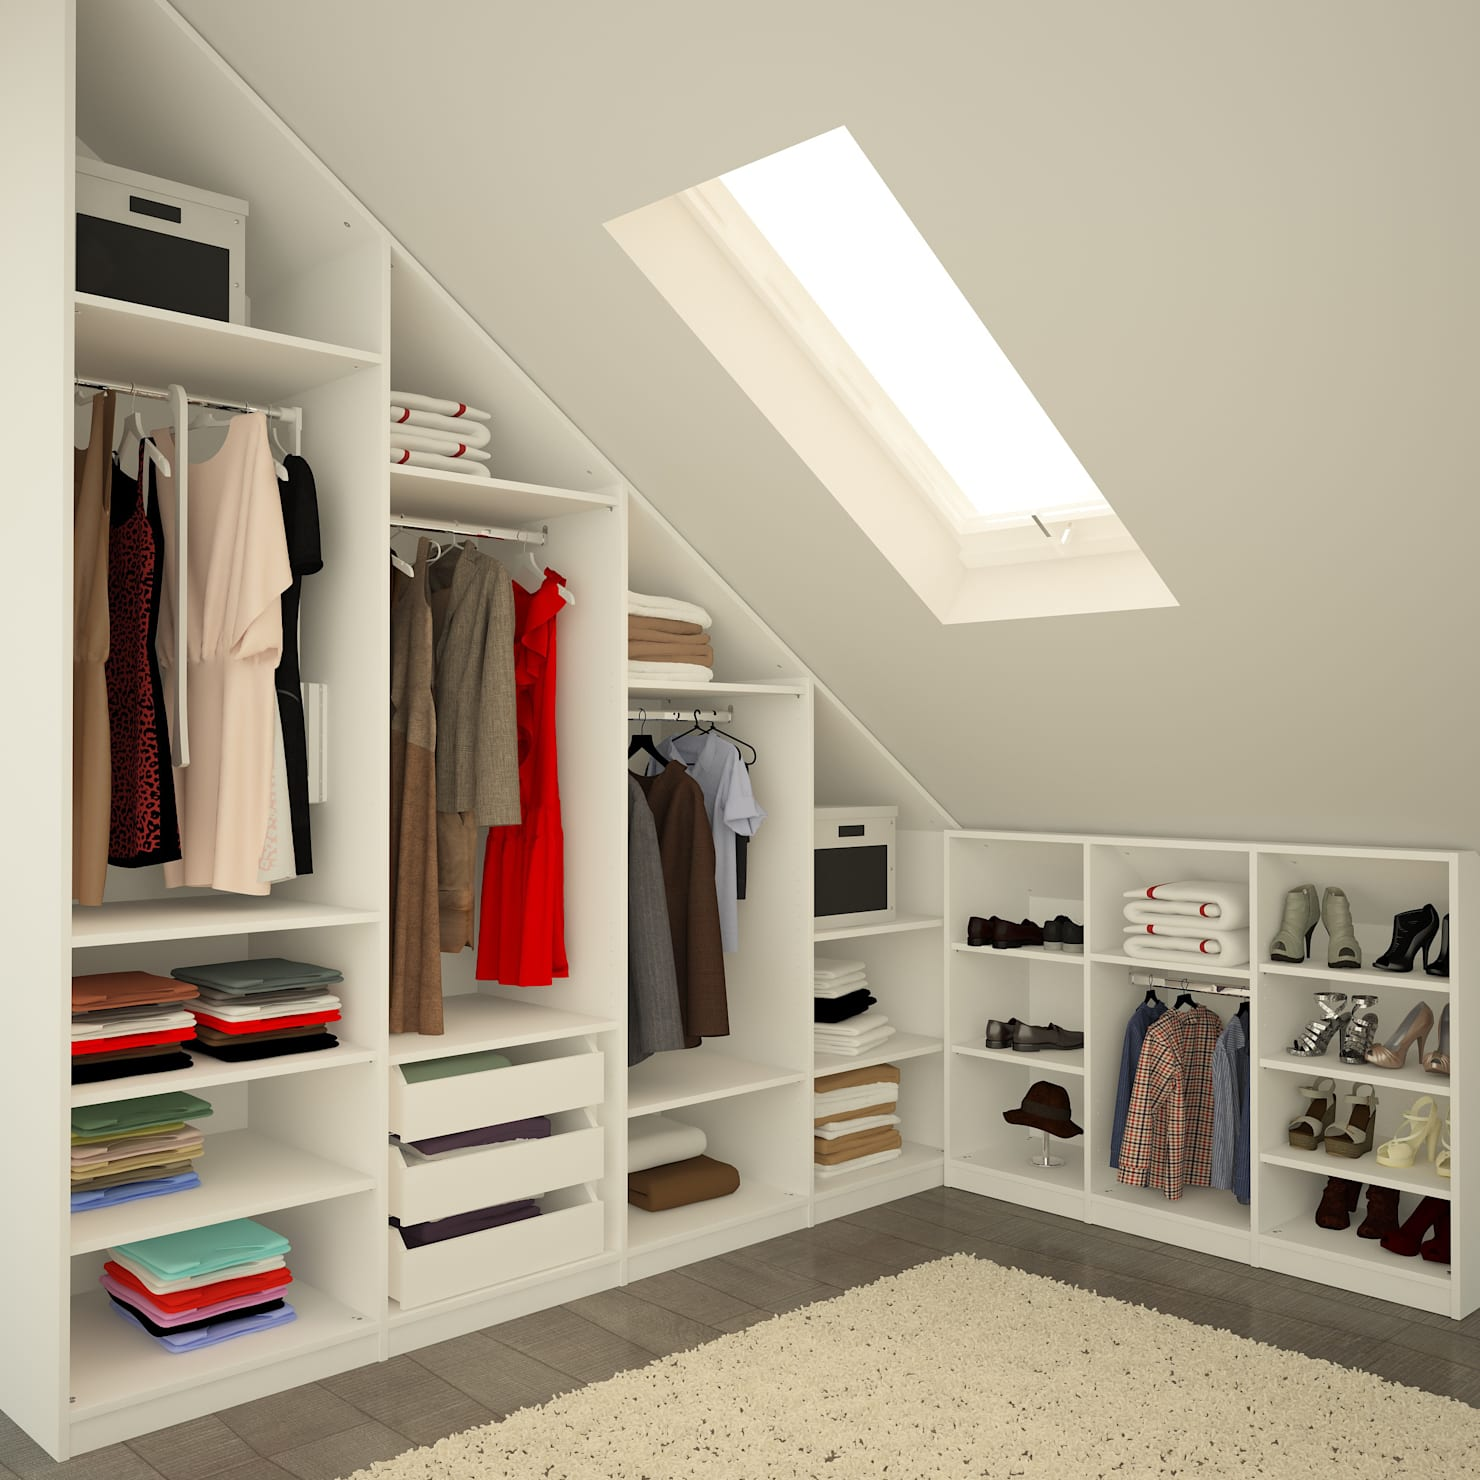 Уборка спальни: пошаговое руководство